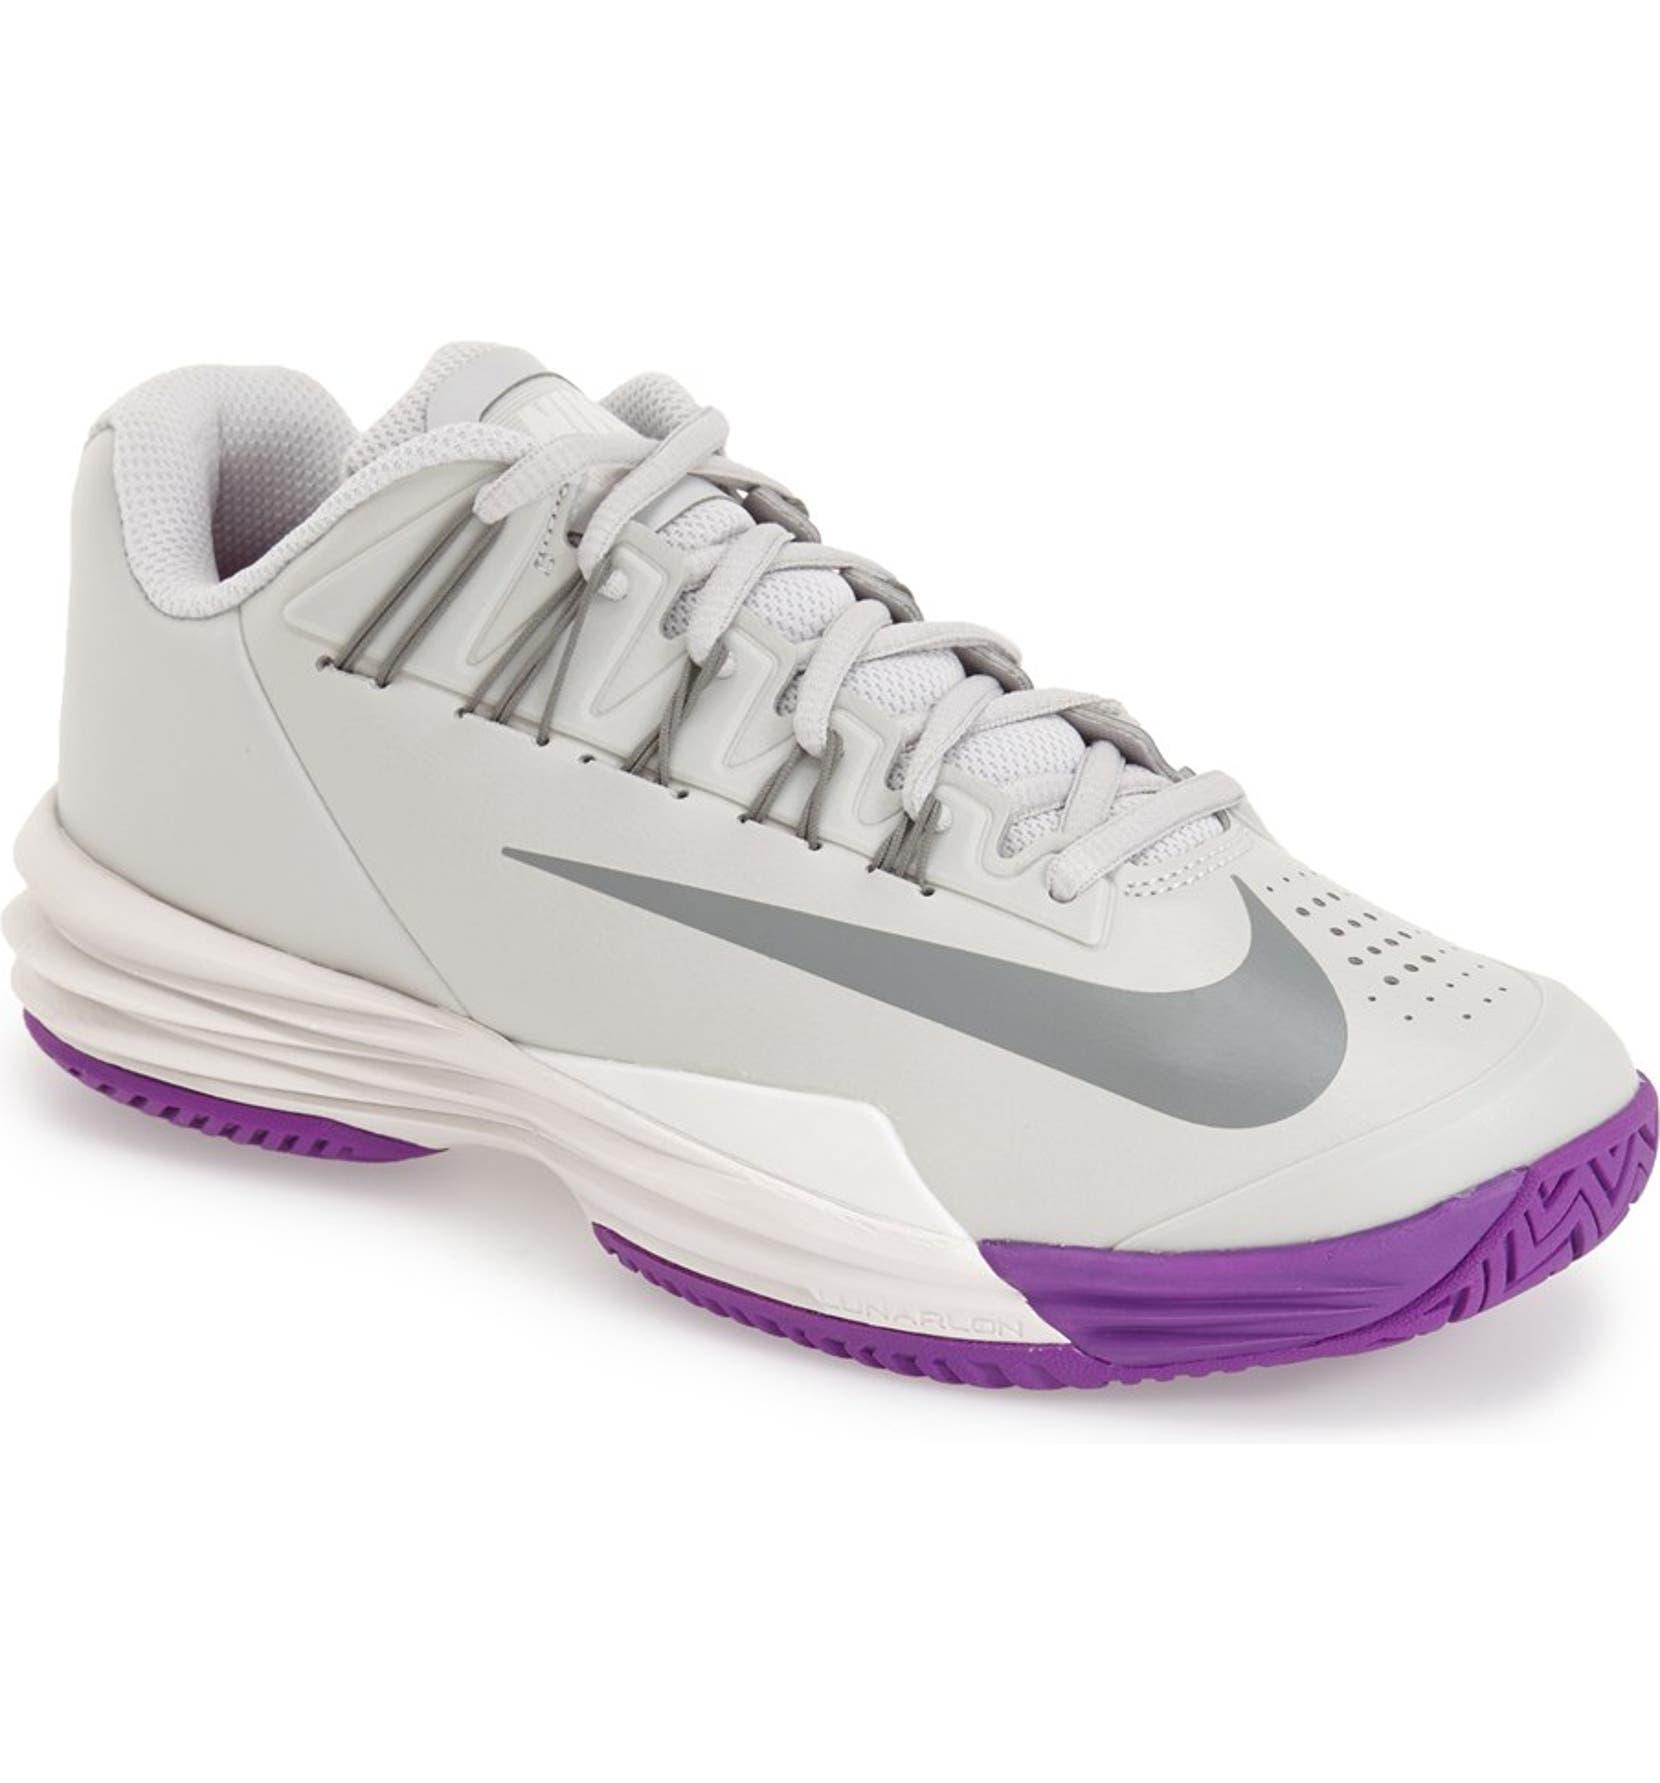 best service 7c1d8 bfa99 Nike  Lunar Ballistec 1.5  Tennis Shoe (Women)   Nordstrom